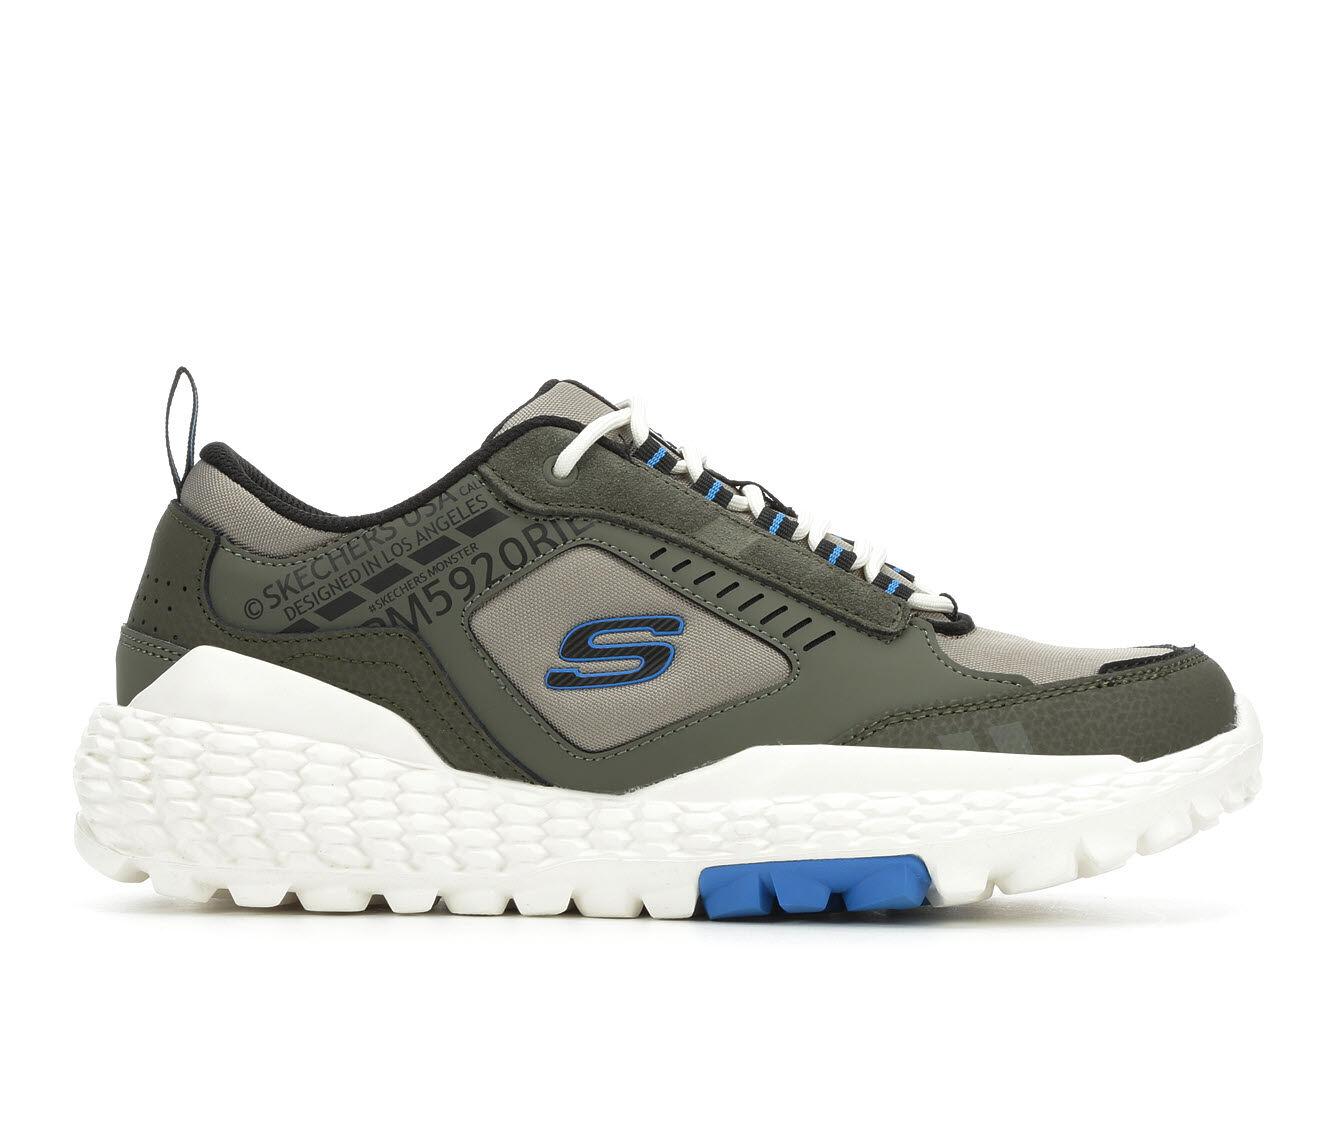 uk shoes_kd1826